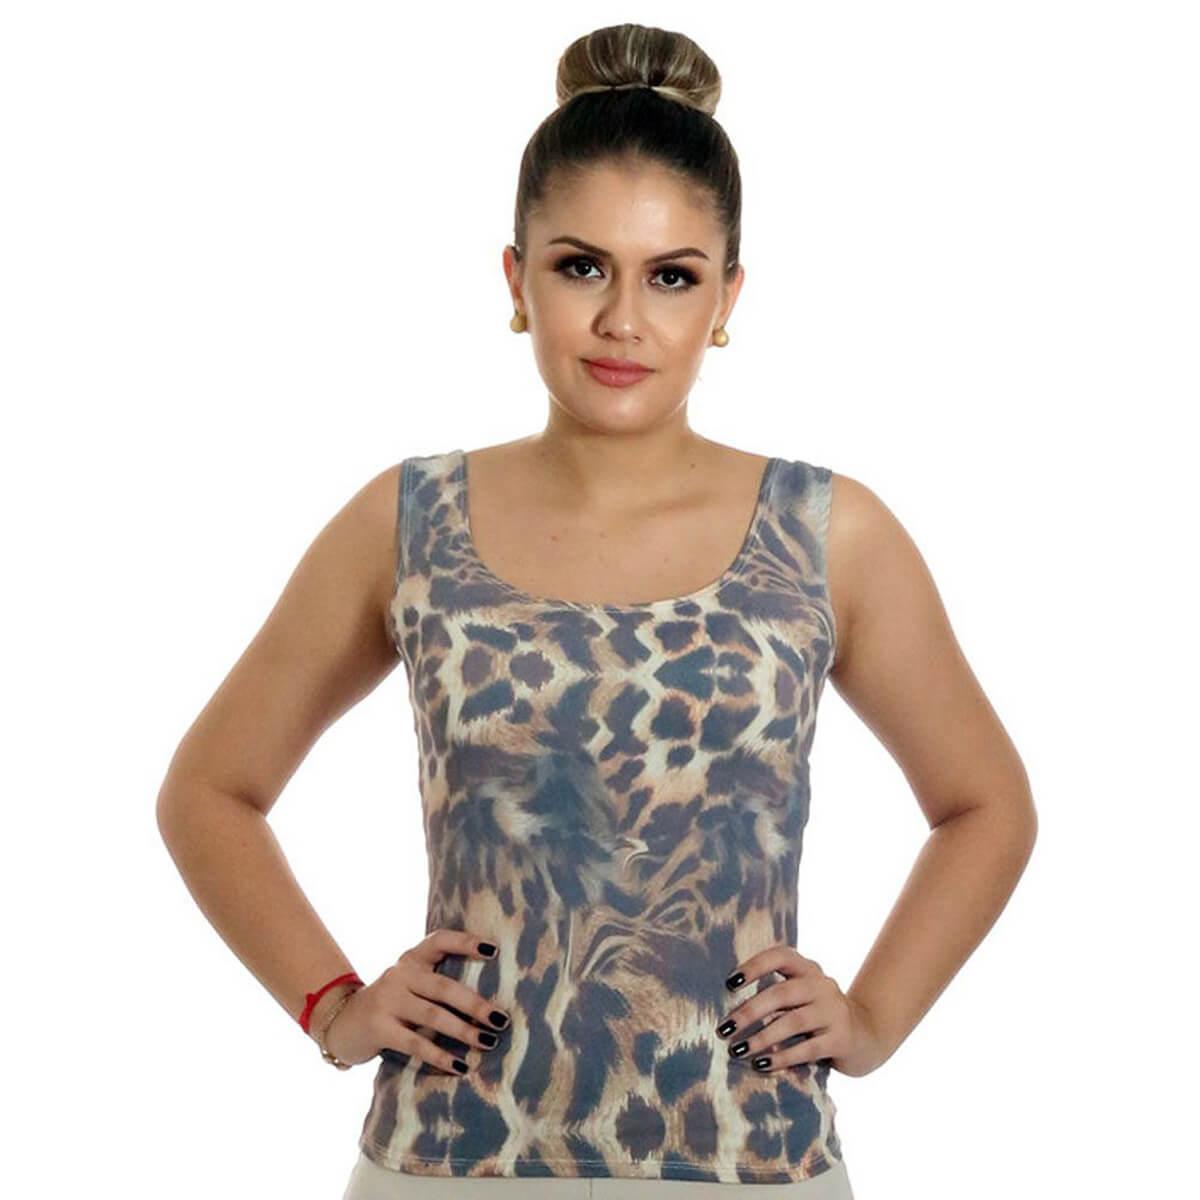 Regata Feminina Estampa Exclusiva Animal Print Onça Decote Redondo